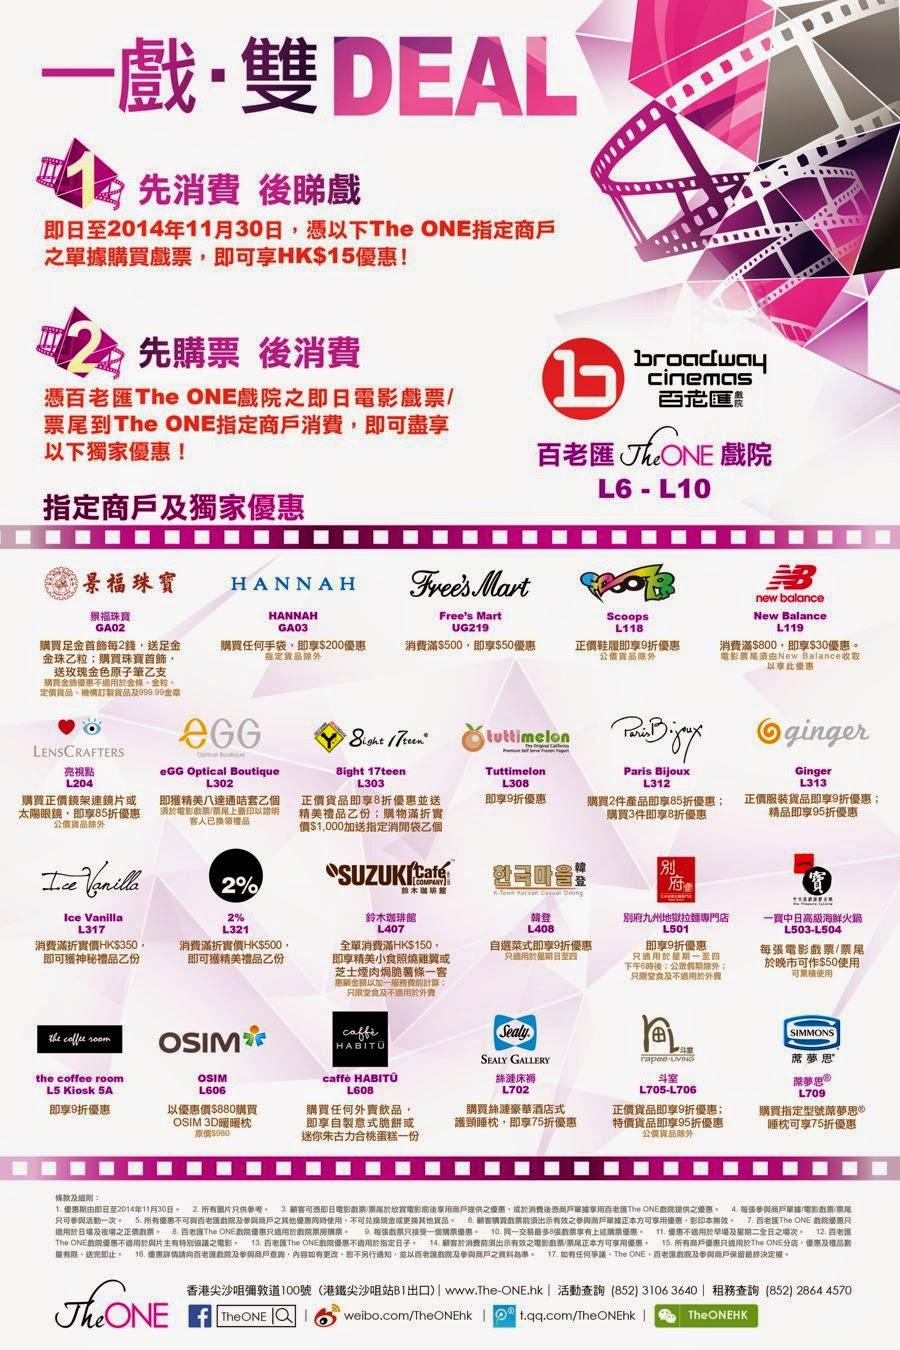 Spd4459, E-buddies entertainment in yau tsim mong (internet marketing and public relations)